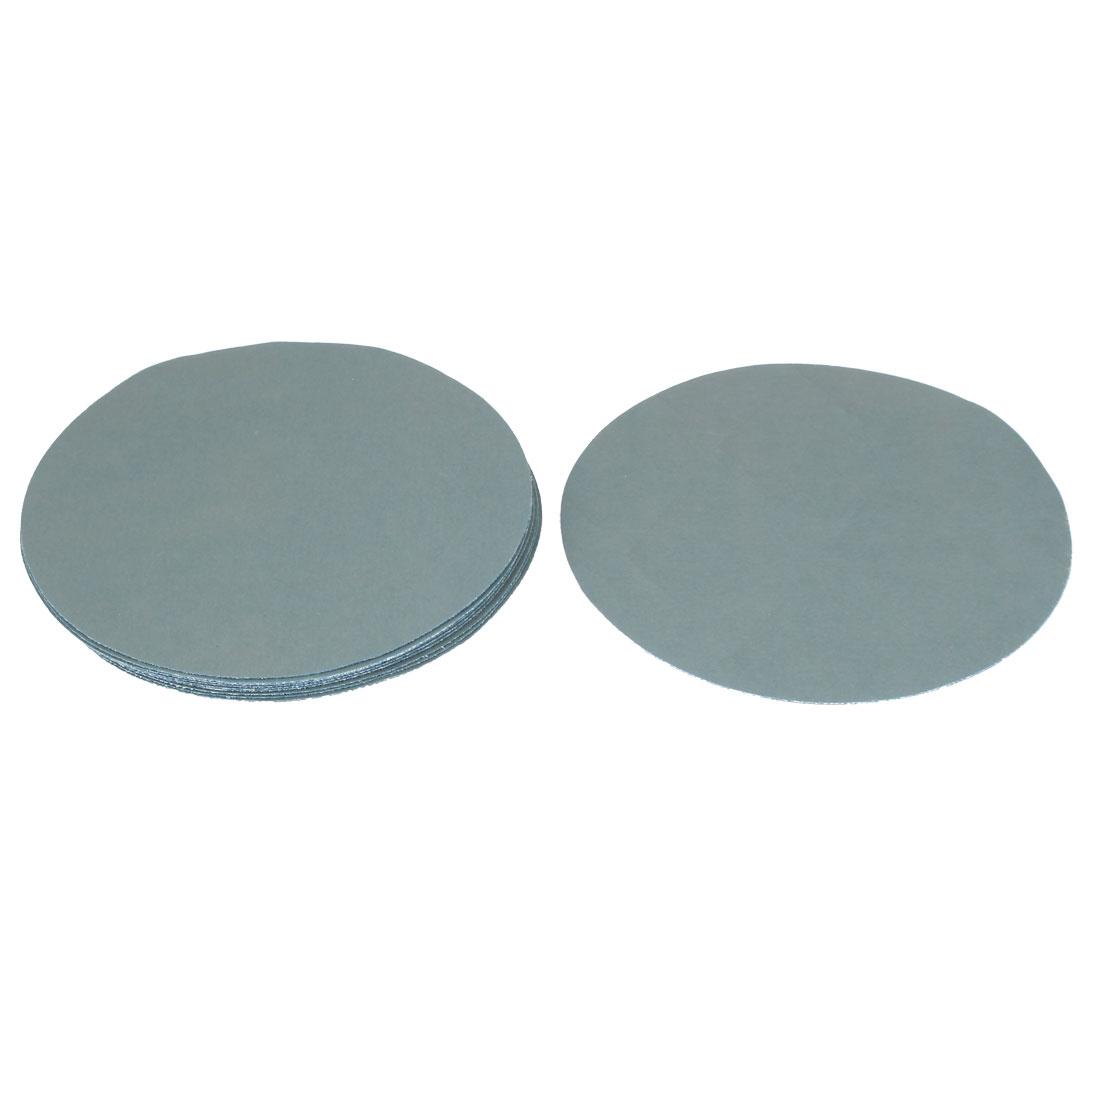 "6"" Dia Wet Dry Silicon Carbide 3000 Grit Polishing Sand Paper 10pcs"